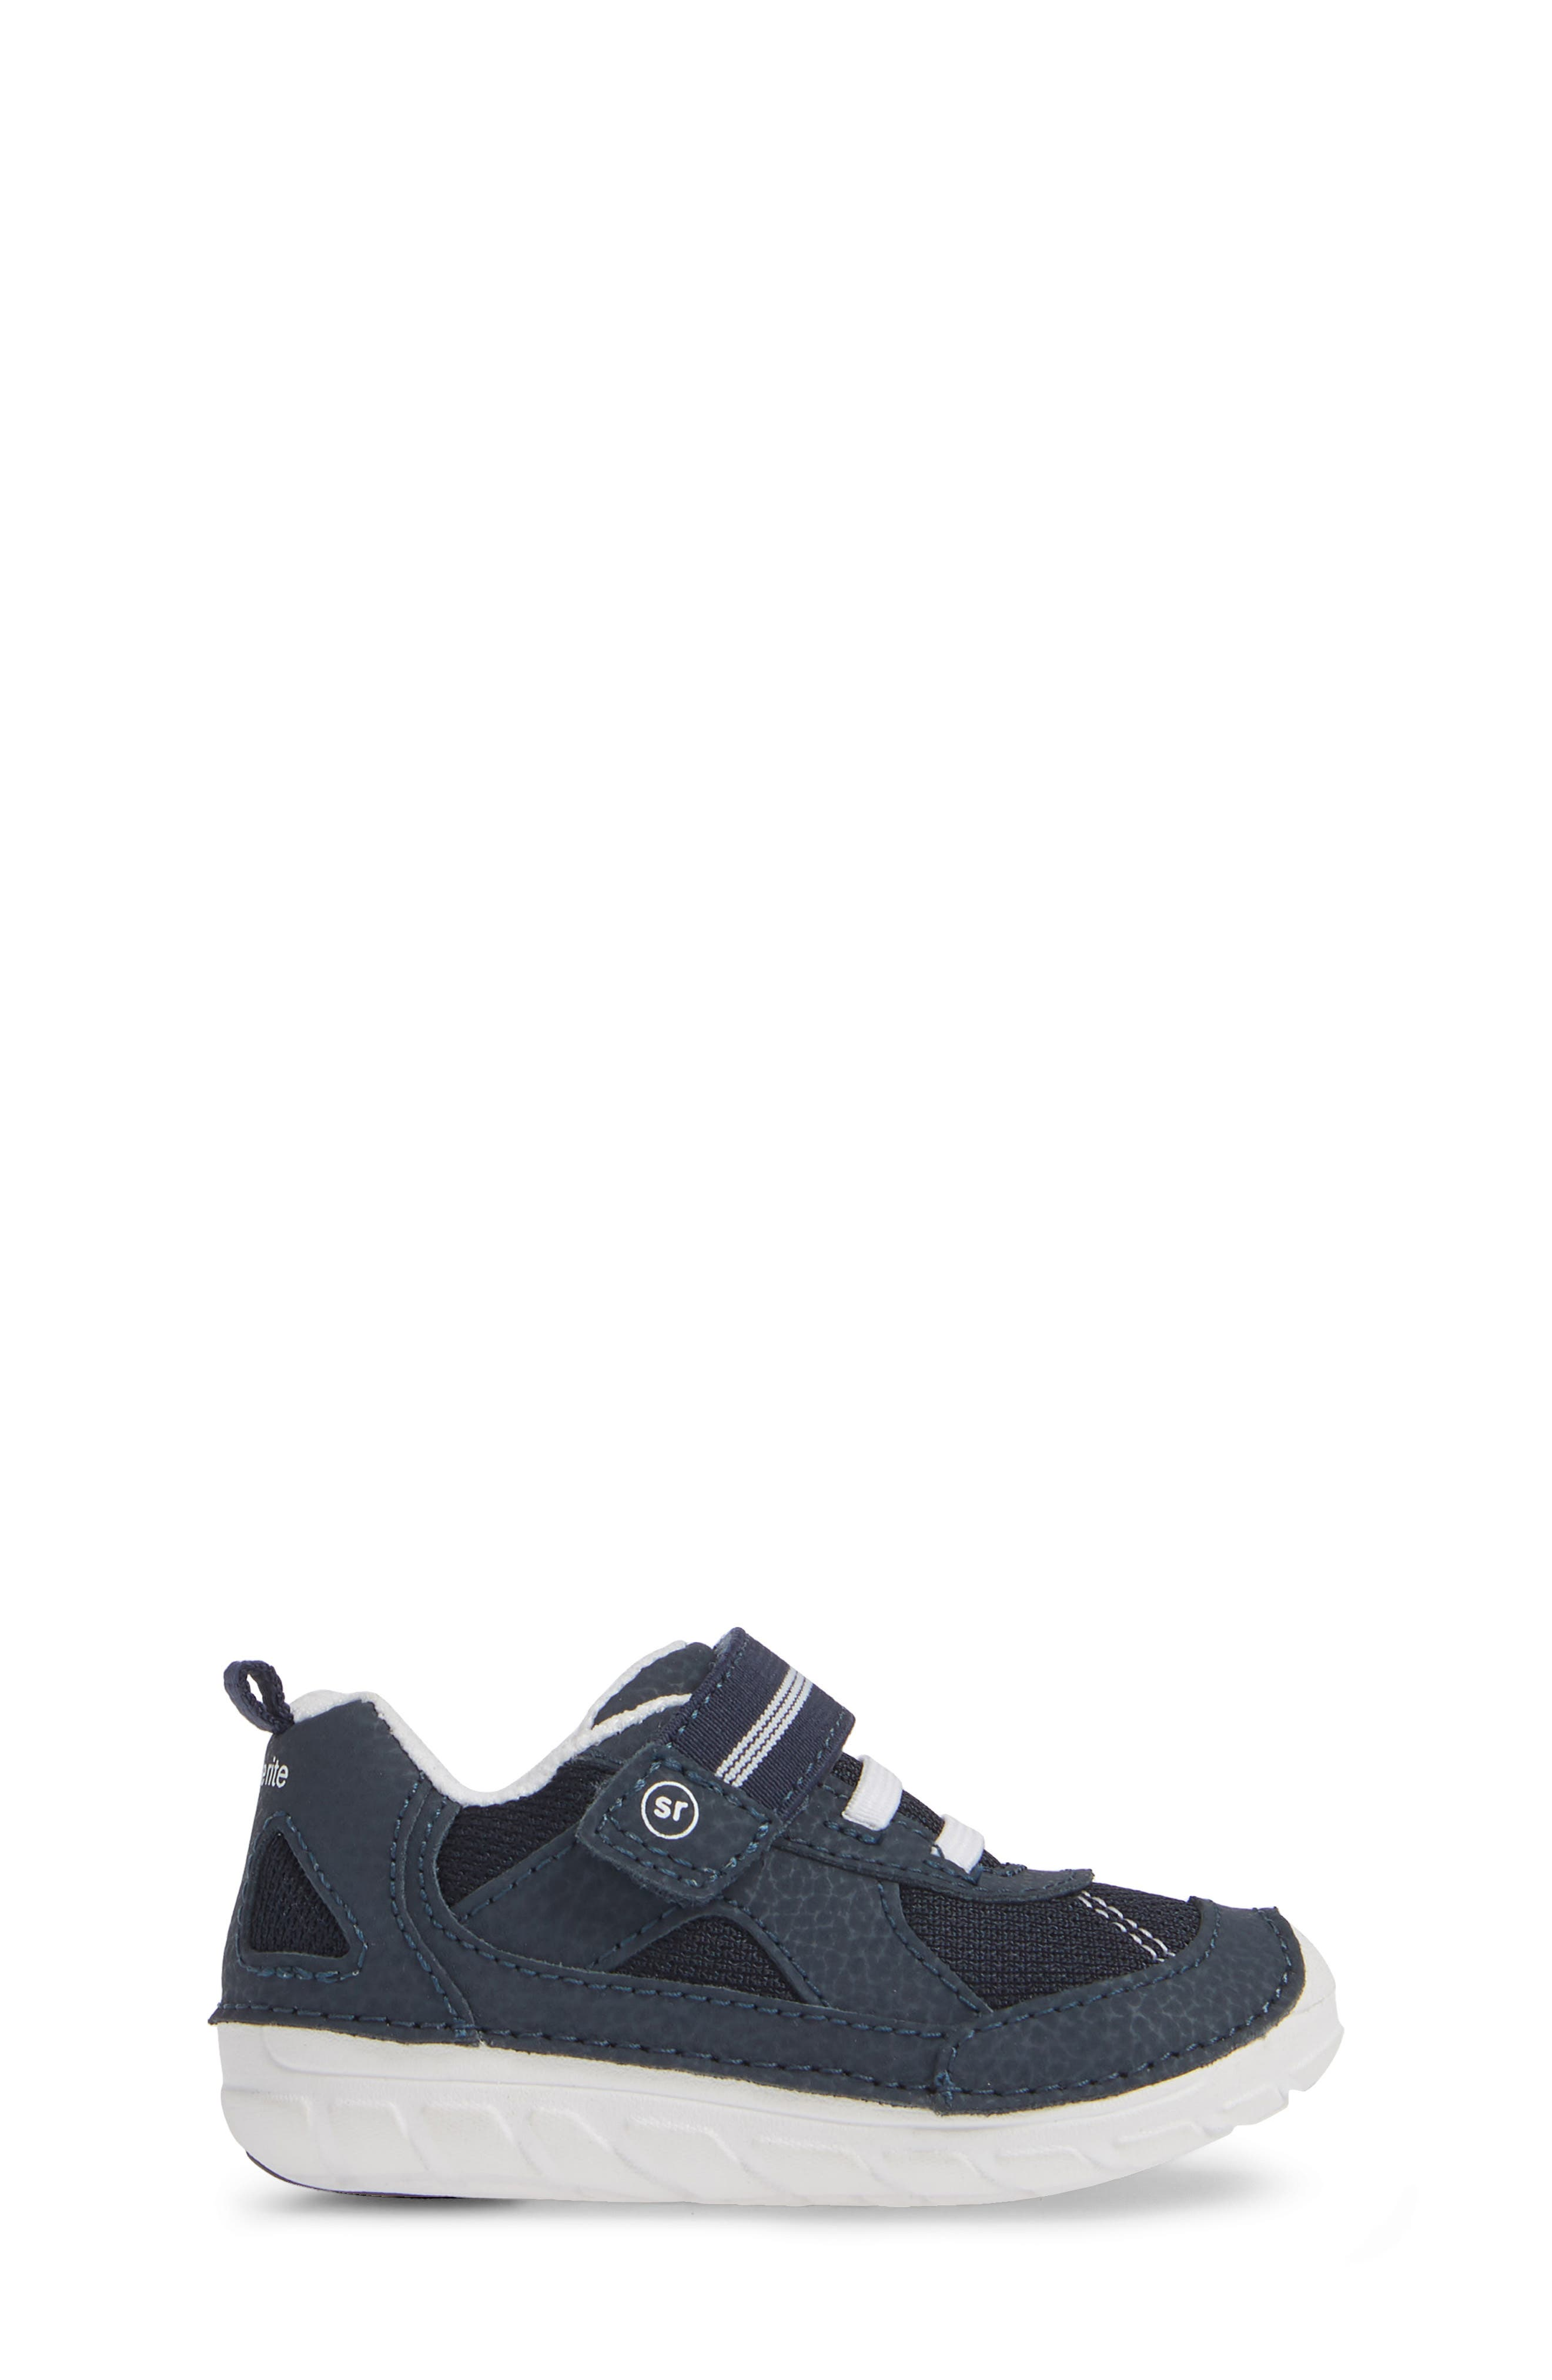 STRIDE RITE, Soft Motion<sup>™</sup> Jamie Sneaker, Alternate thumbnail 3, color, NAVY/ WHITE